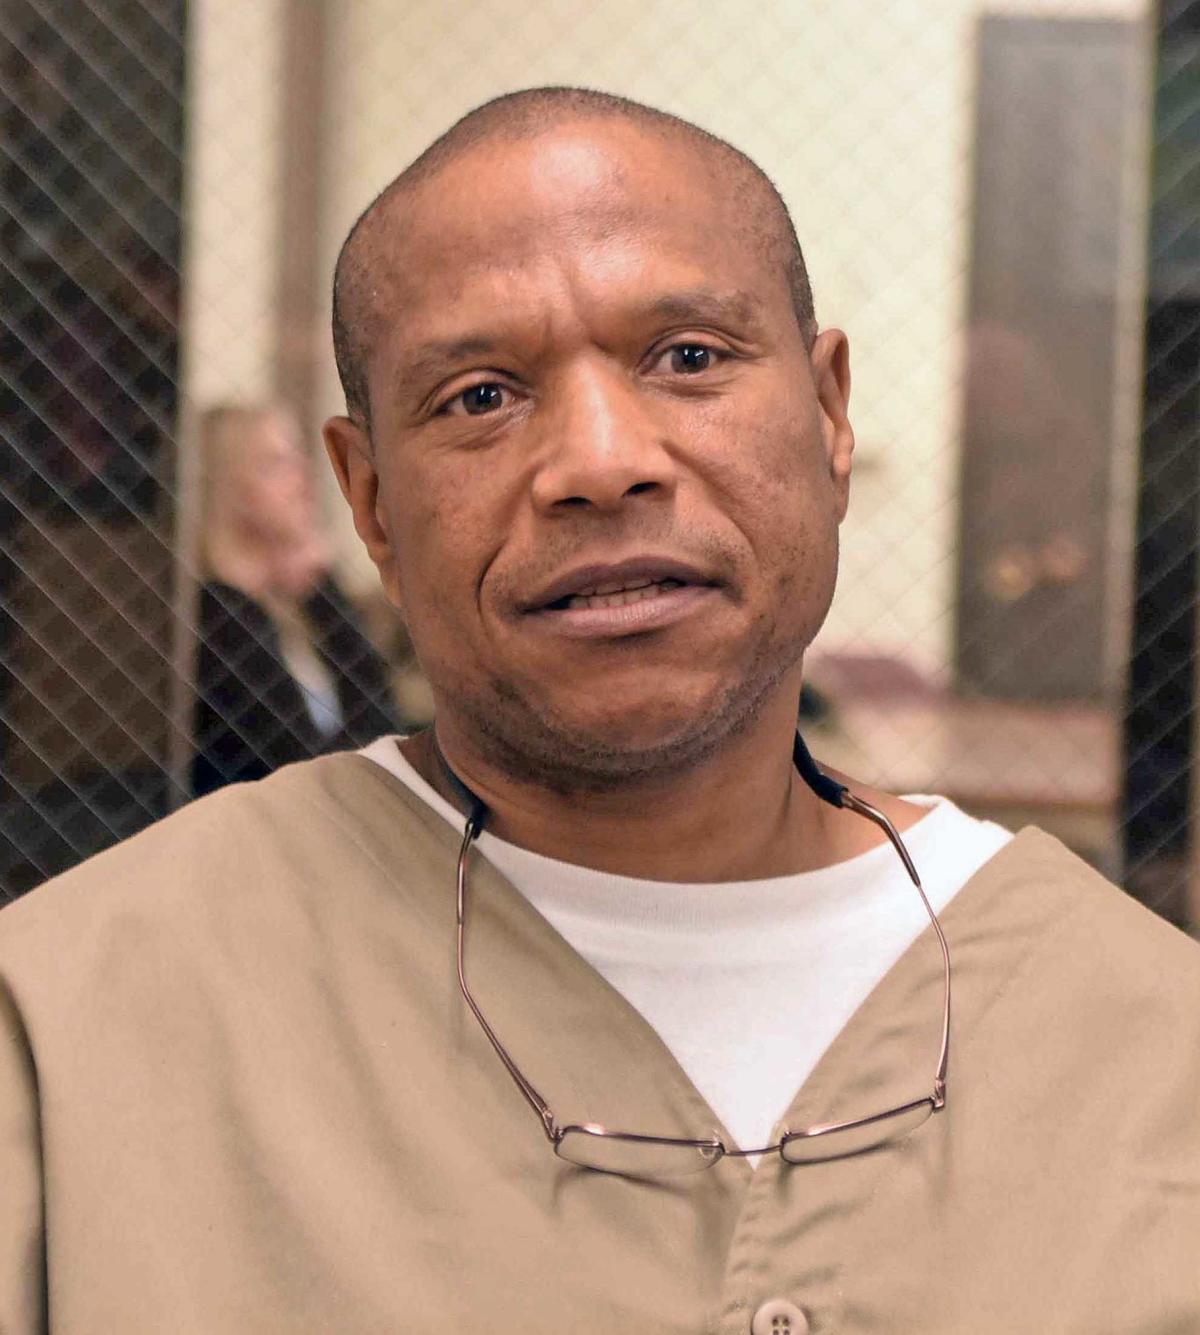 102319-nws-prison4.jpg